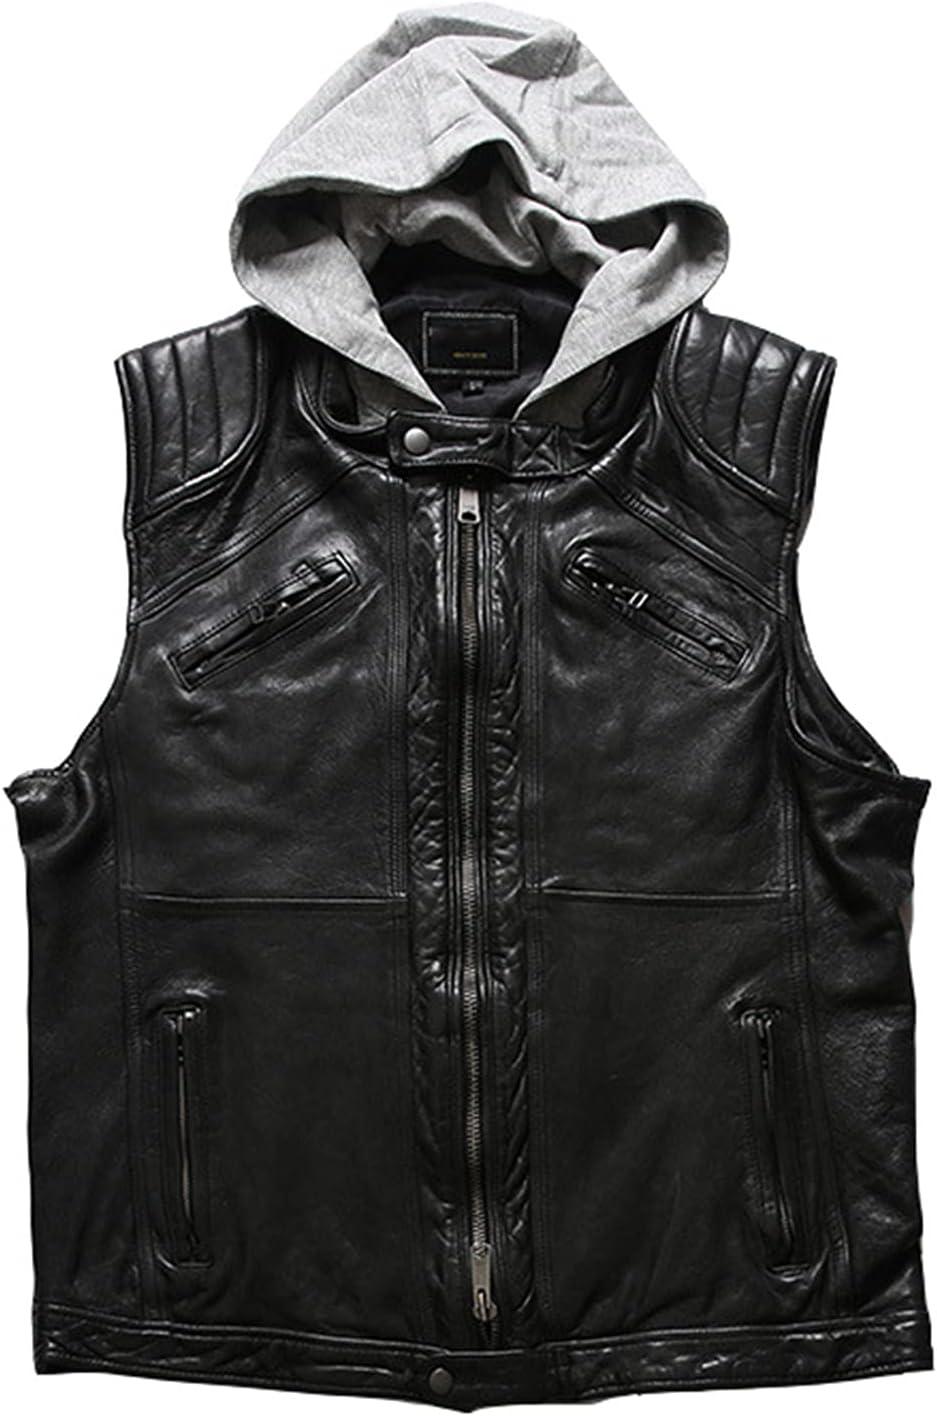 WMJL Genuine Lambskin Leather Men's Japanese Retro Hunt Black Classic Fashion Biker Vest Jacket with Removable Hood,Black,M